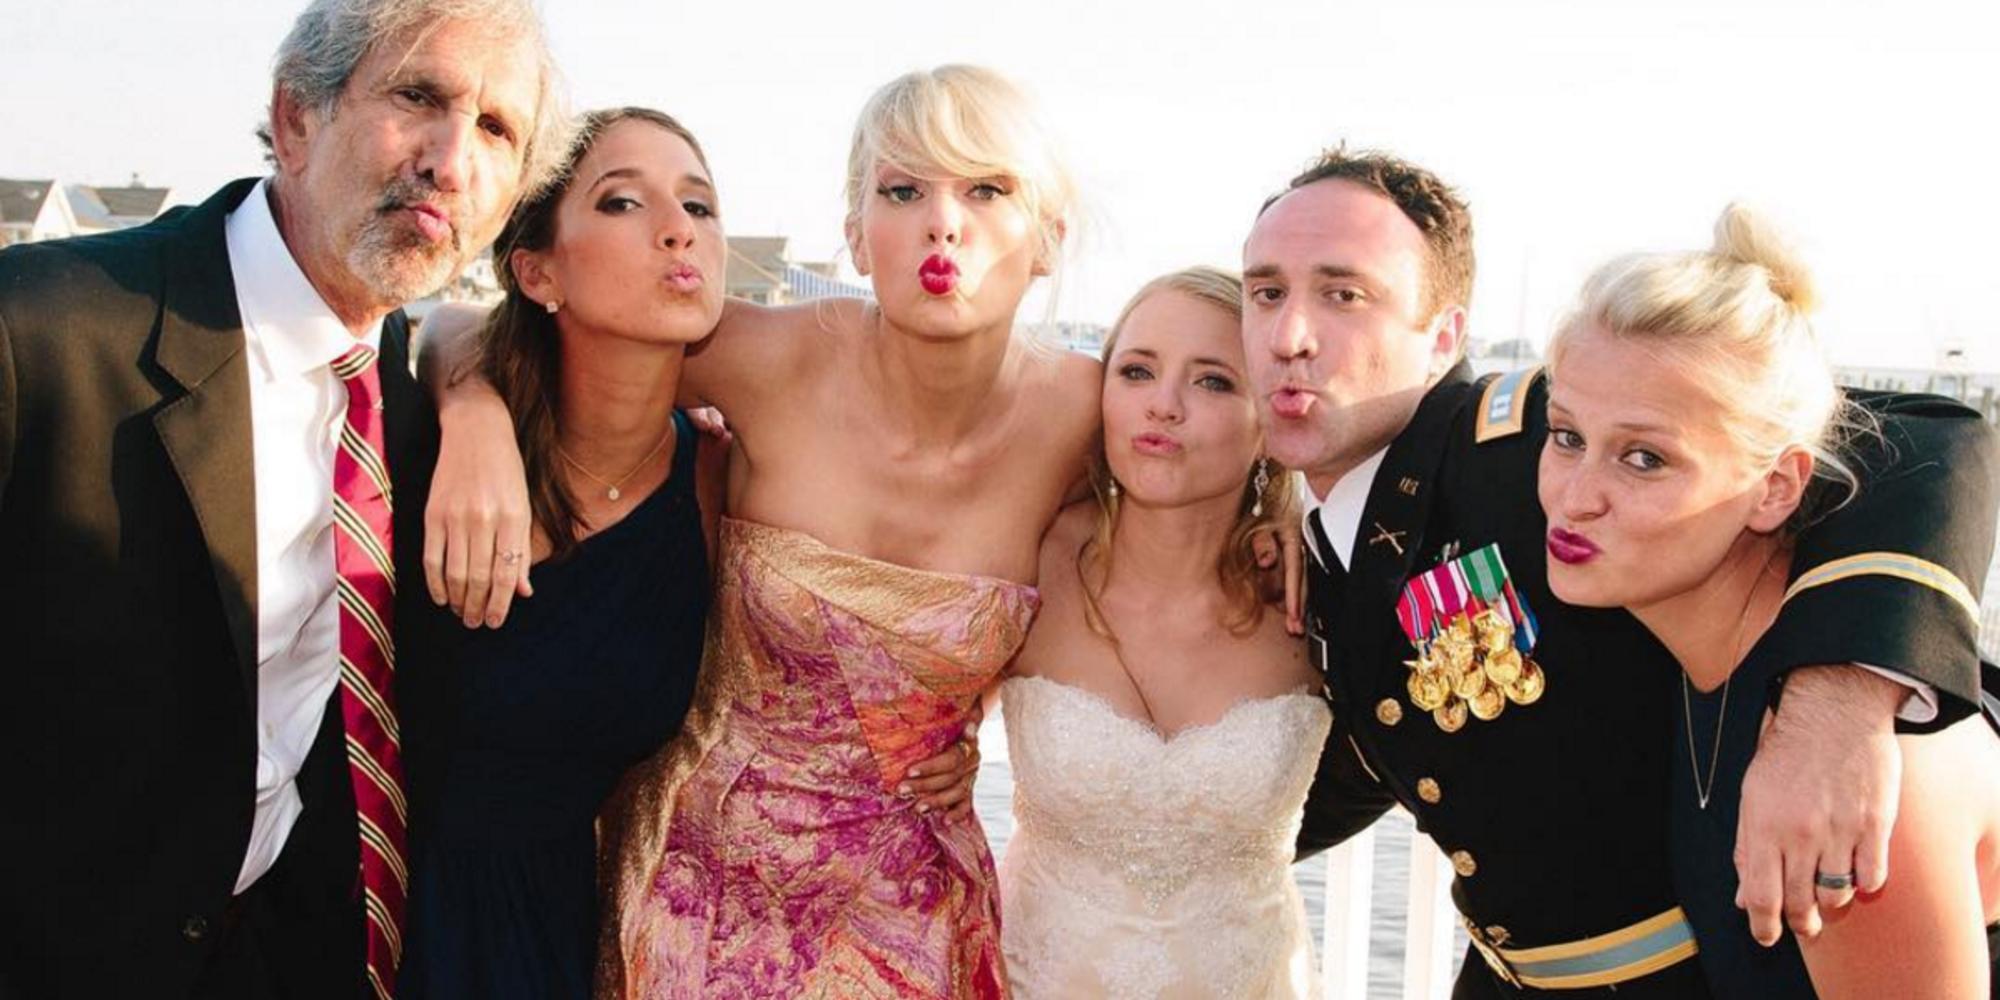 Taylor Swift Crashes New Jersey Wedding